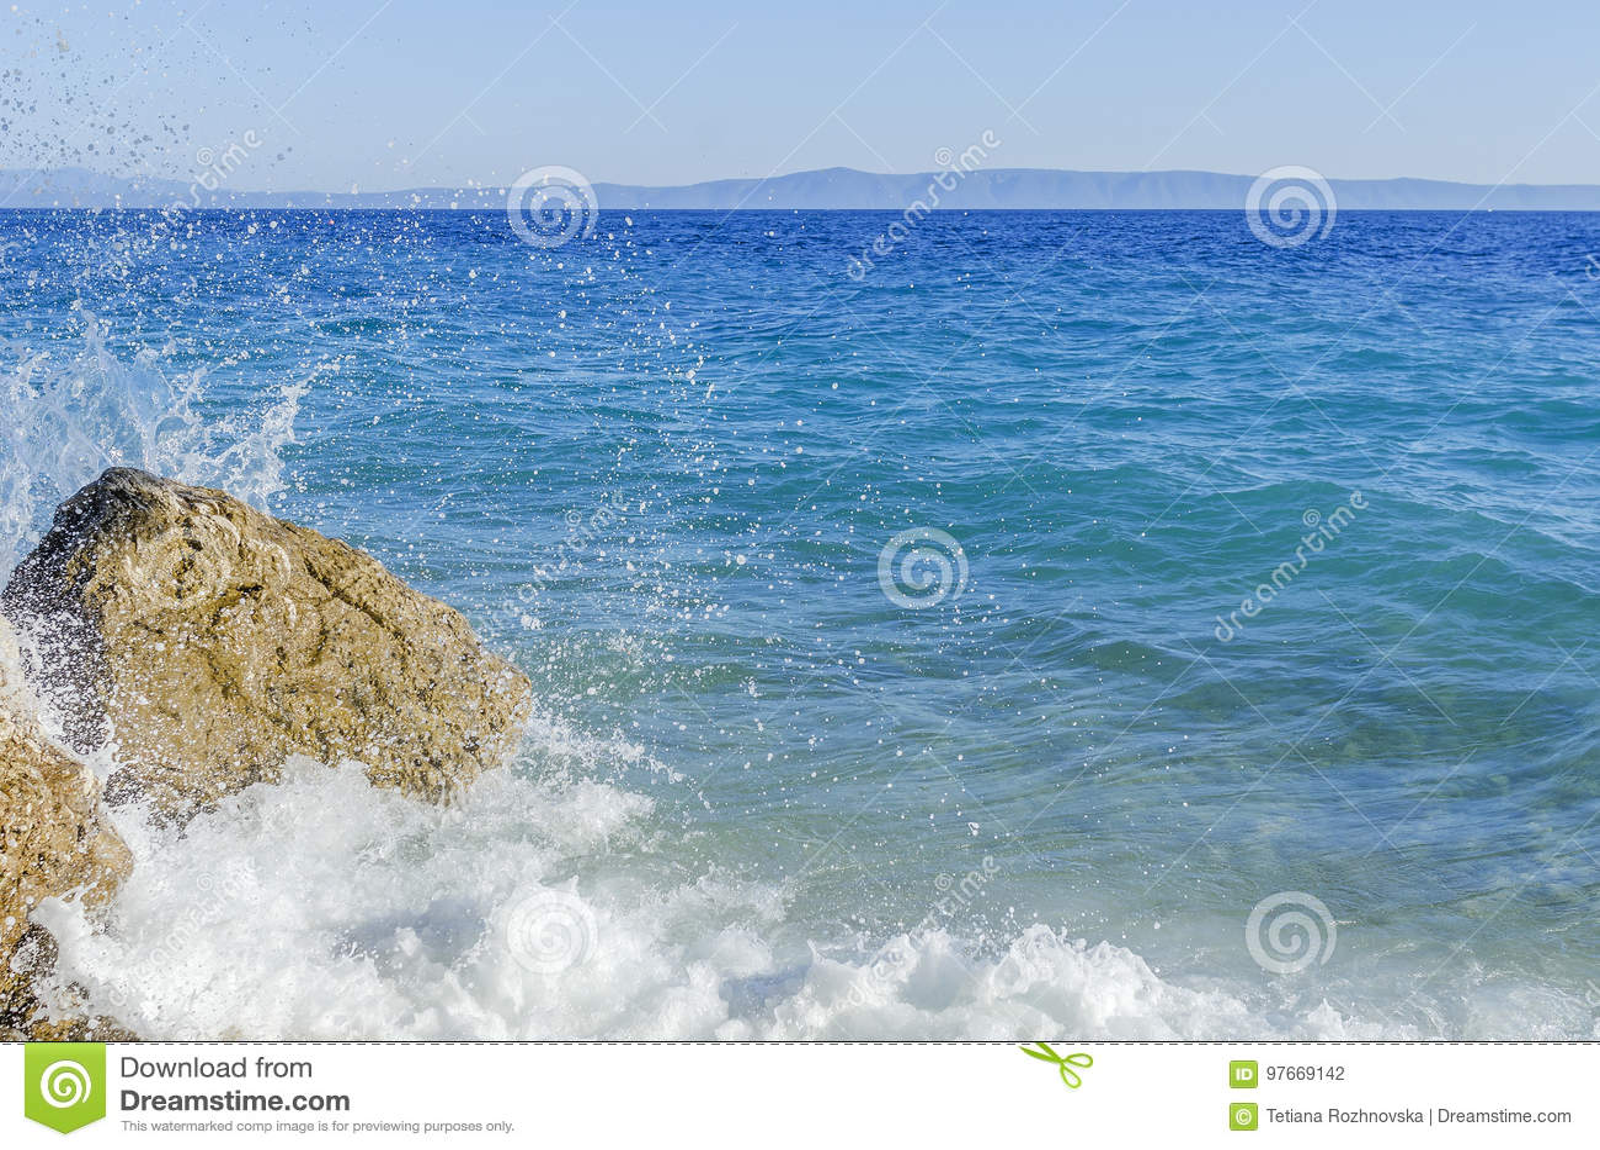 Sea wave is broken about stones.